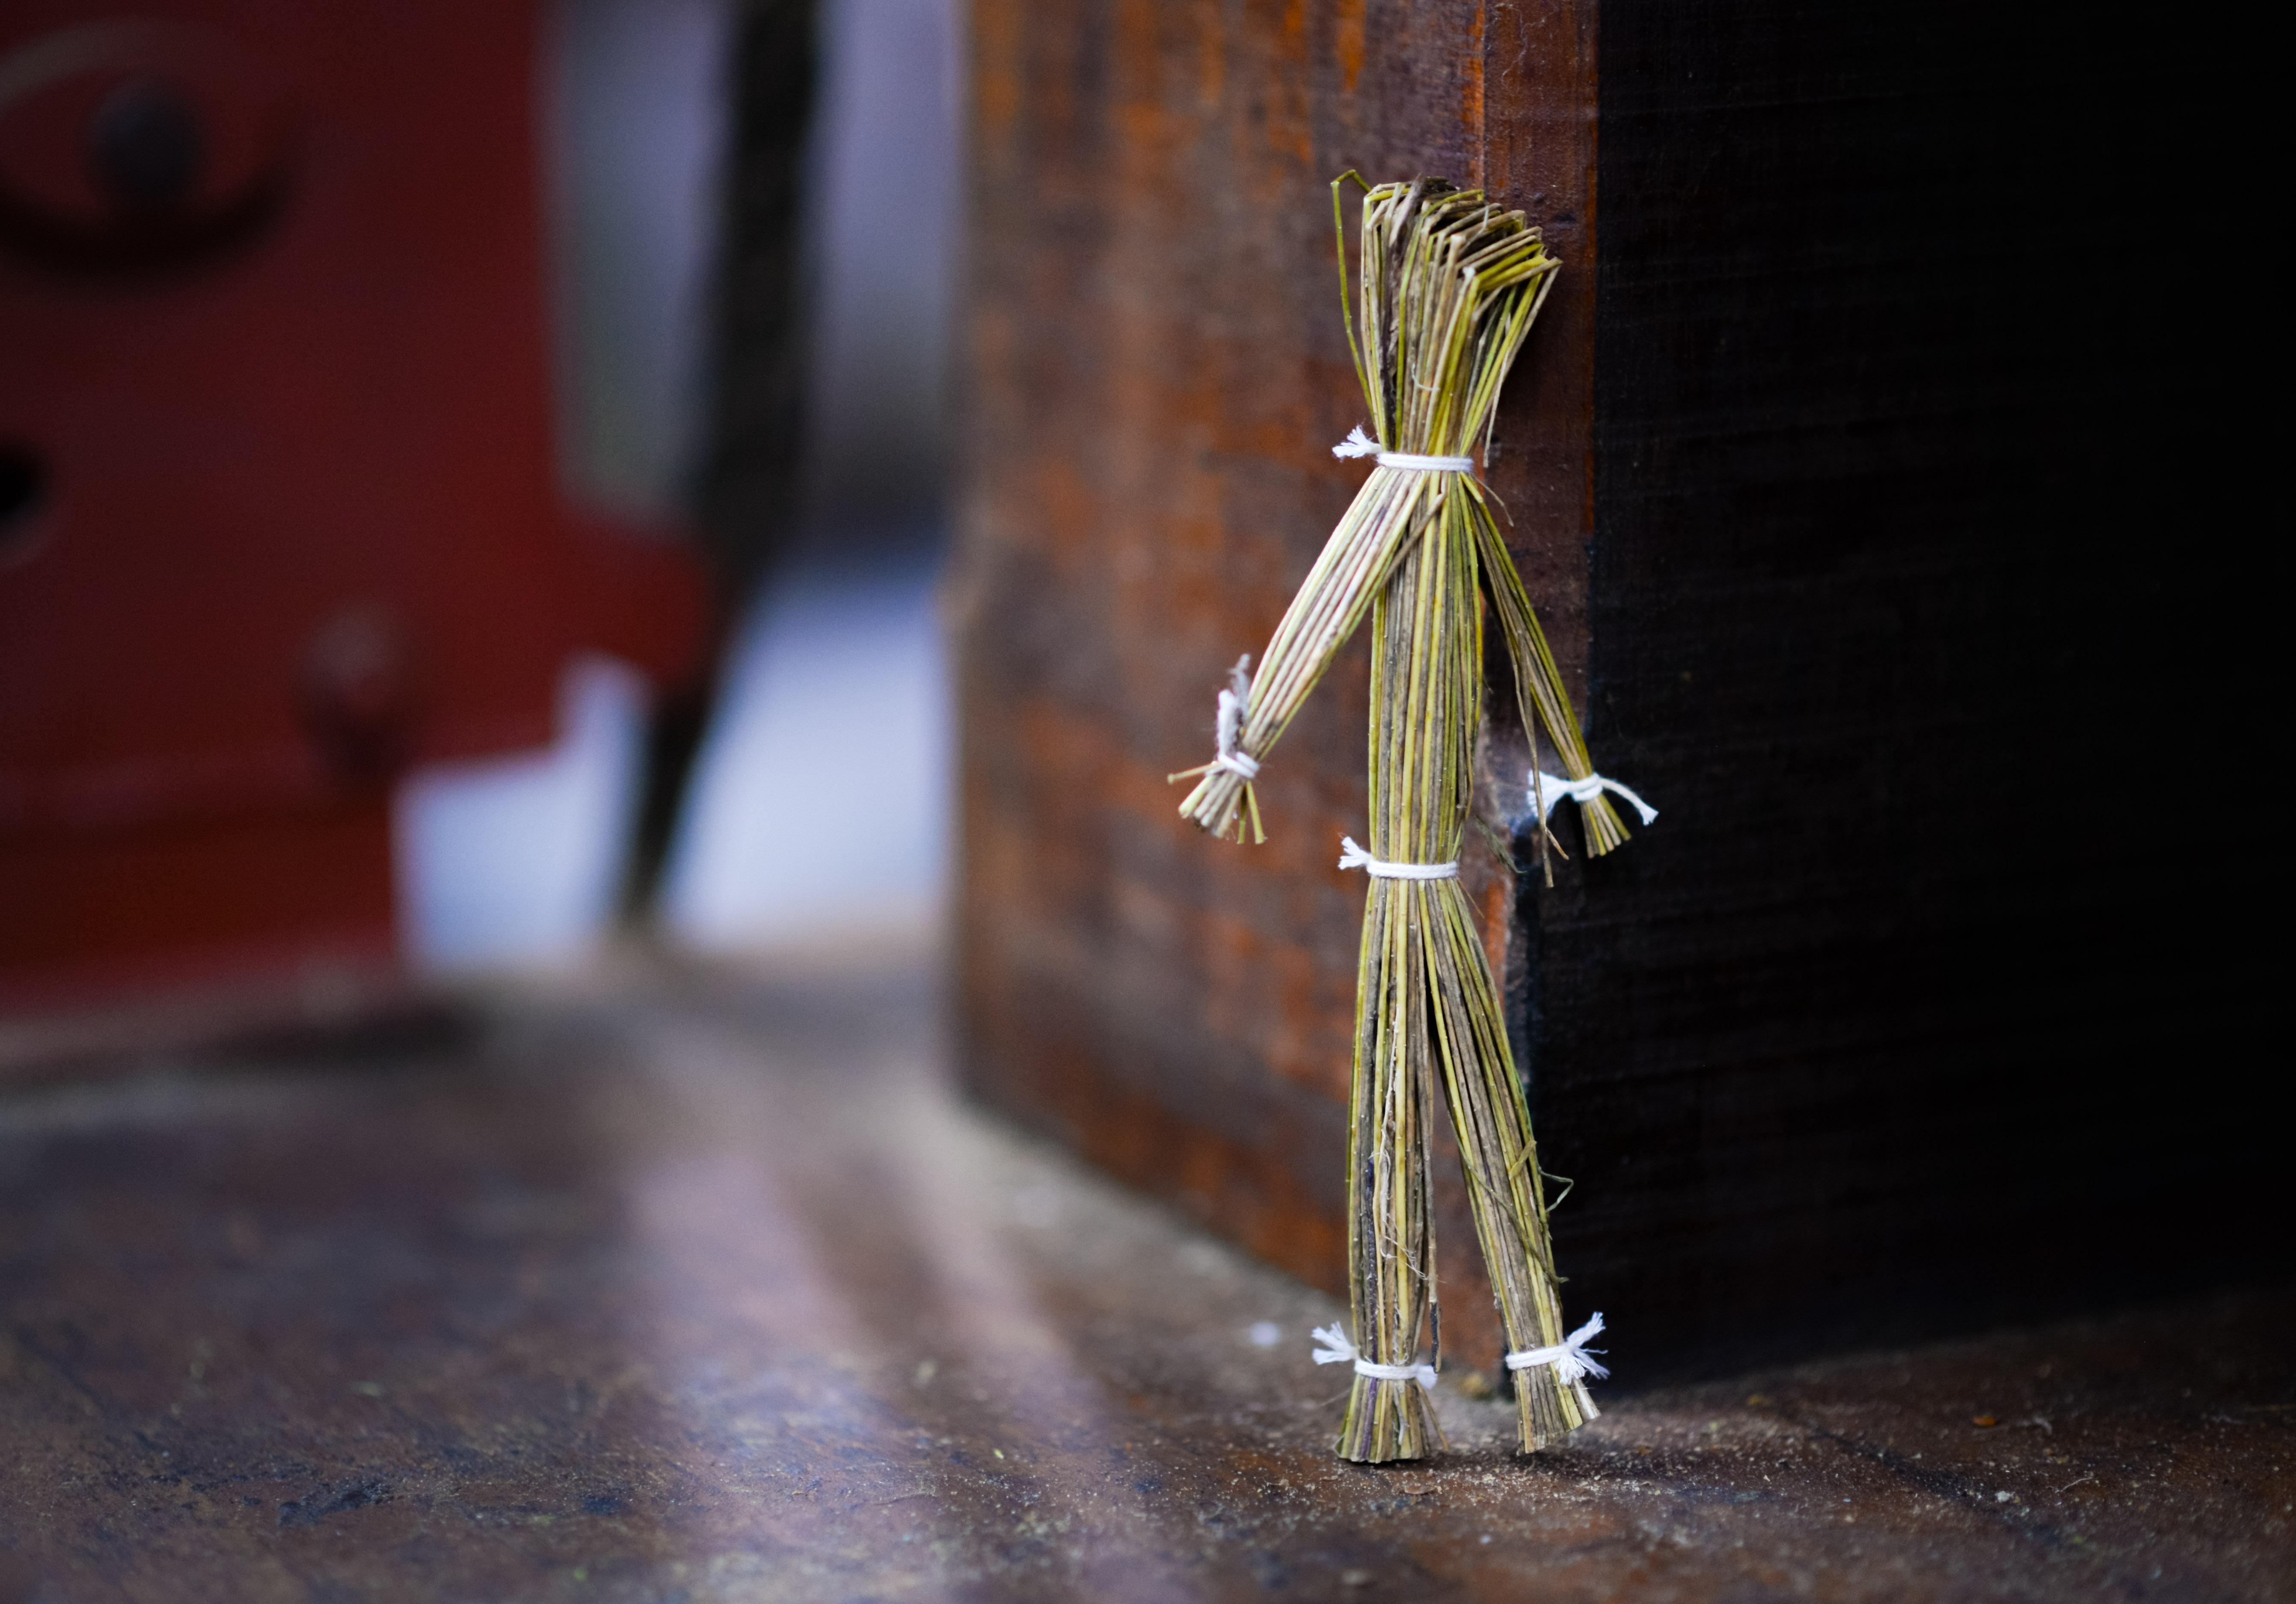 straw-puppet-doll-decoration-630750.jpeg (5366×3749)